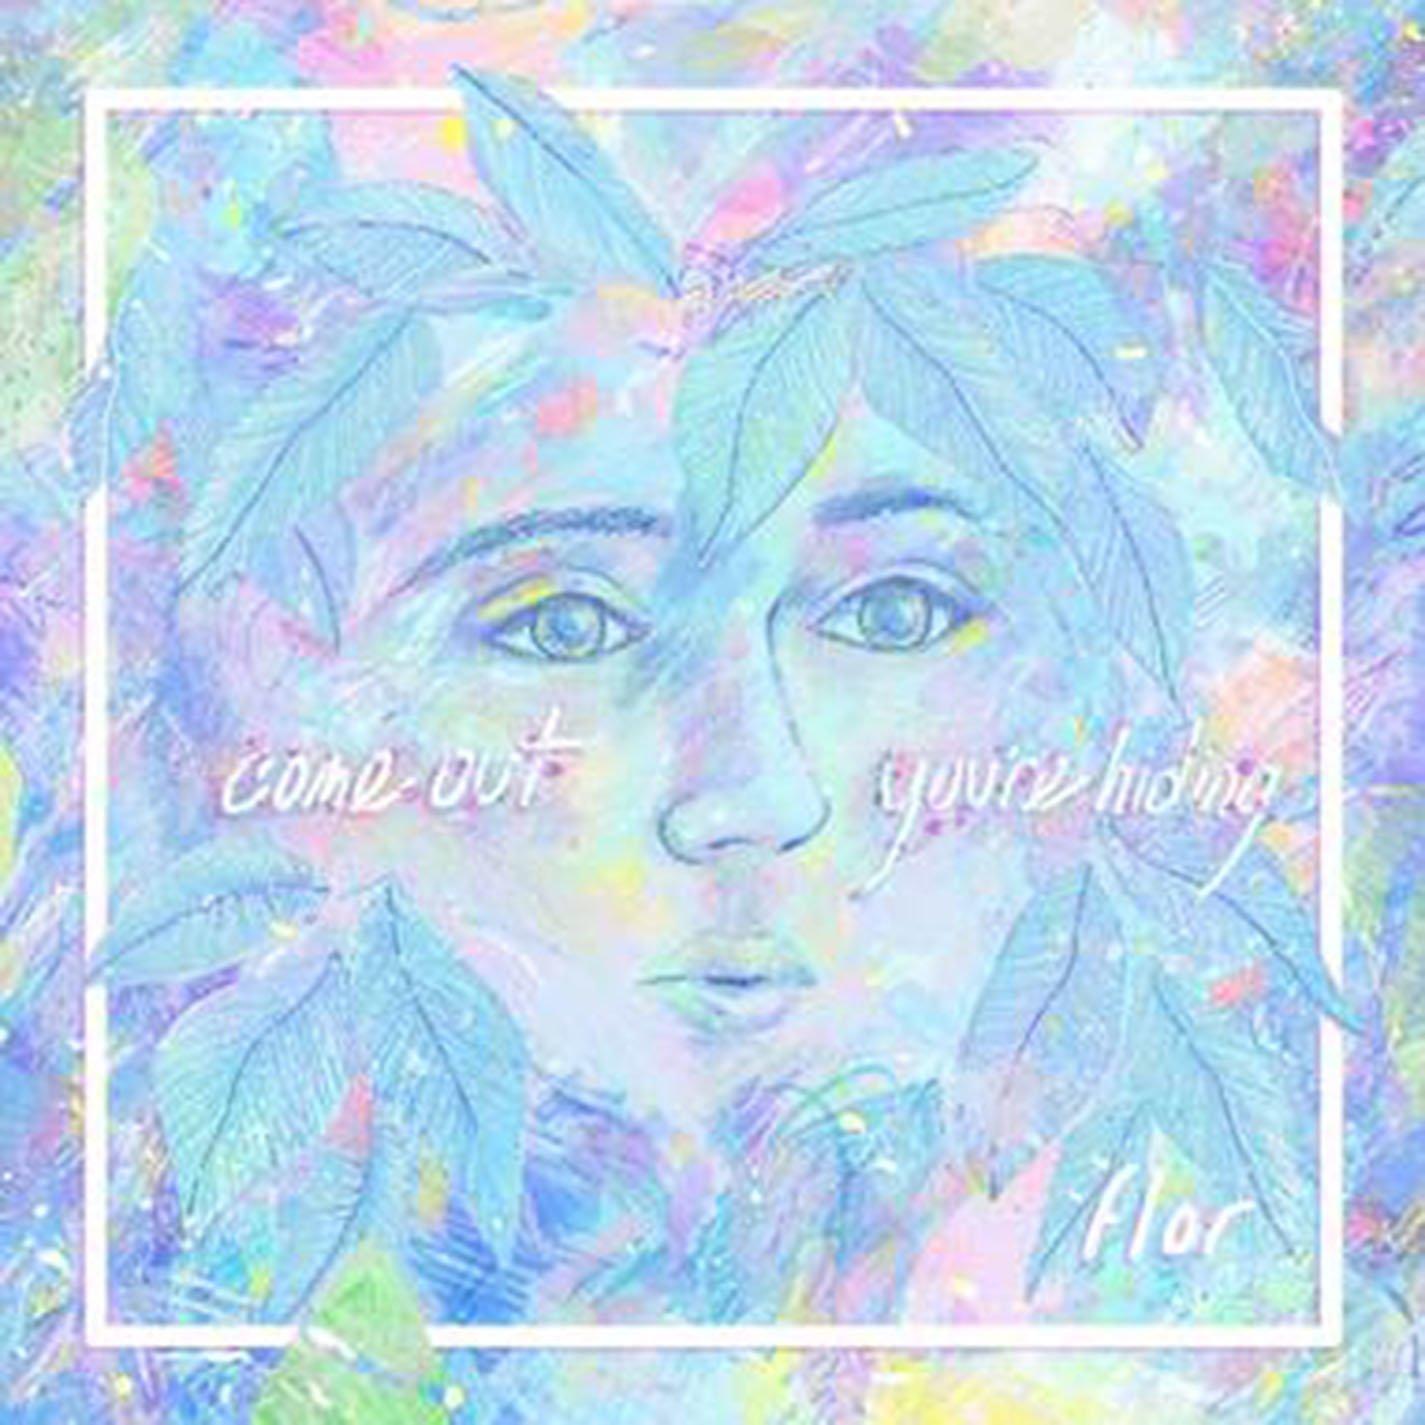 Vinilo : Flor - Come Out. Youre Hiding (Deluxe Edition, Digital Download Card)